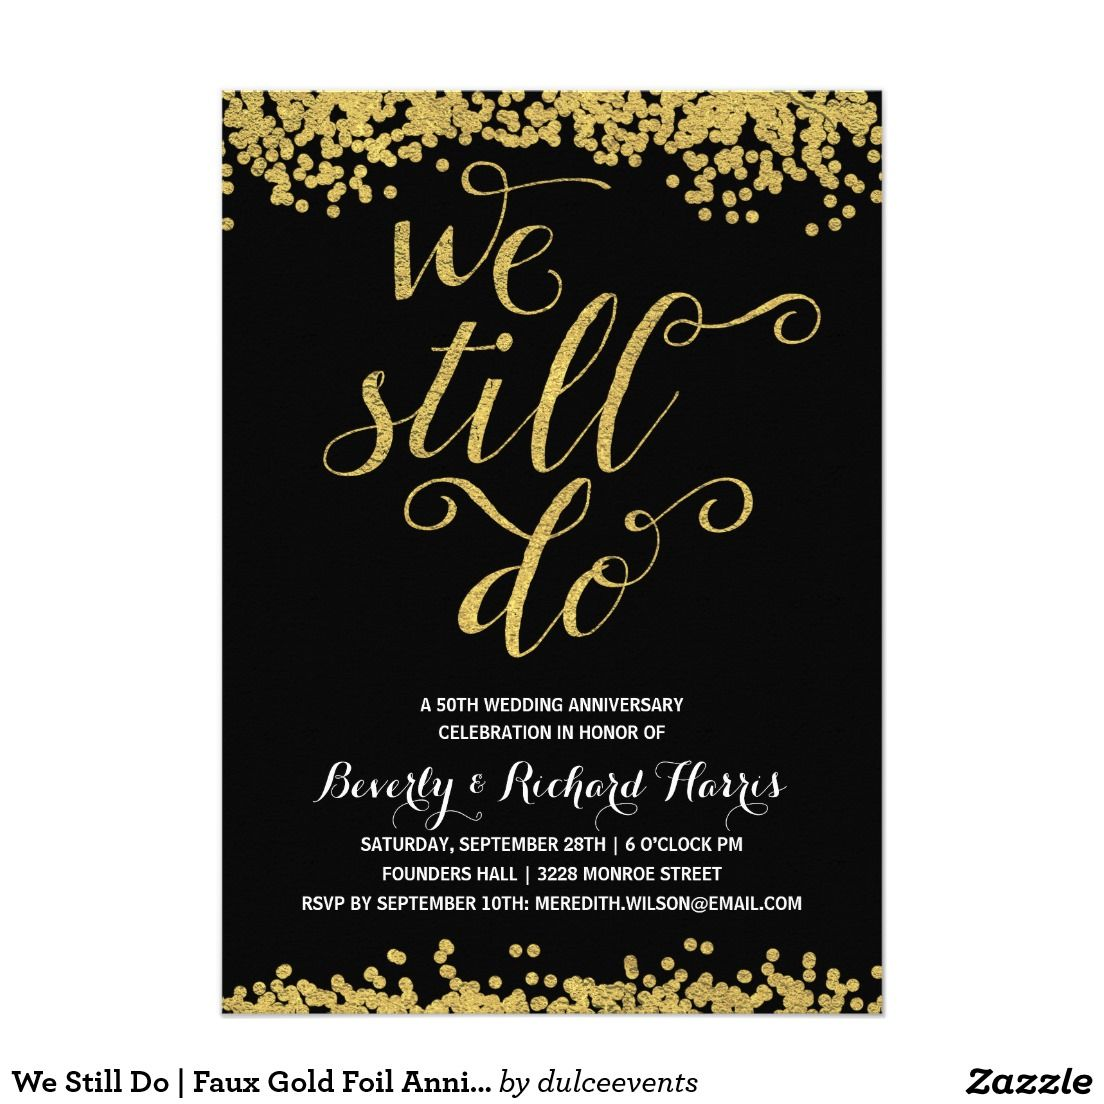 We Still Do | Faux Gold Foil Anniversary Party Invitation | Gold ...